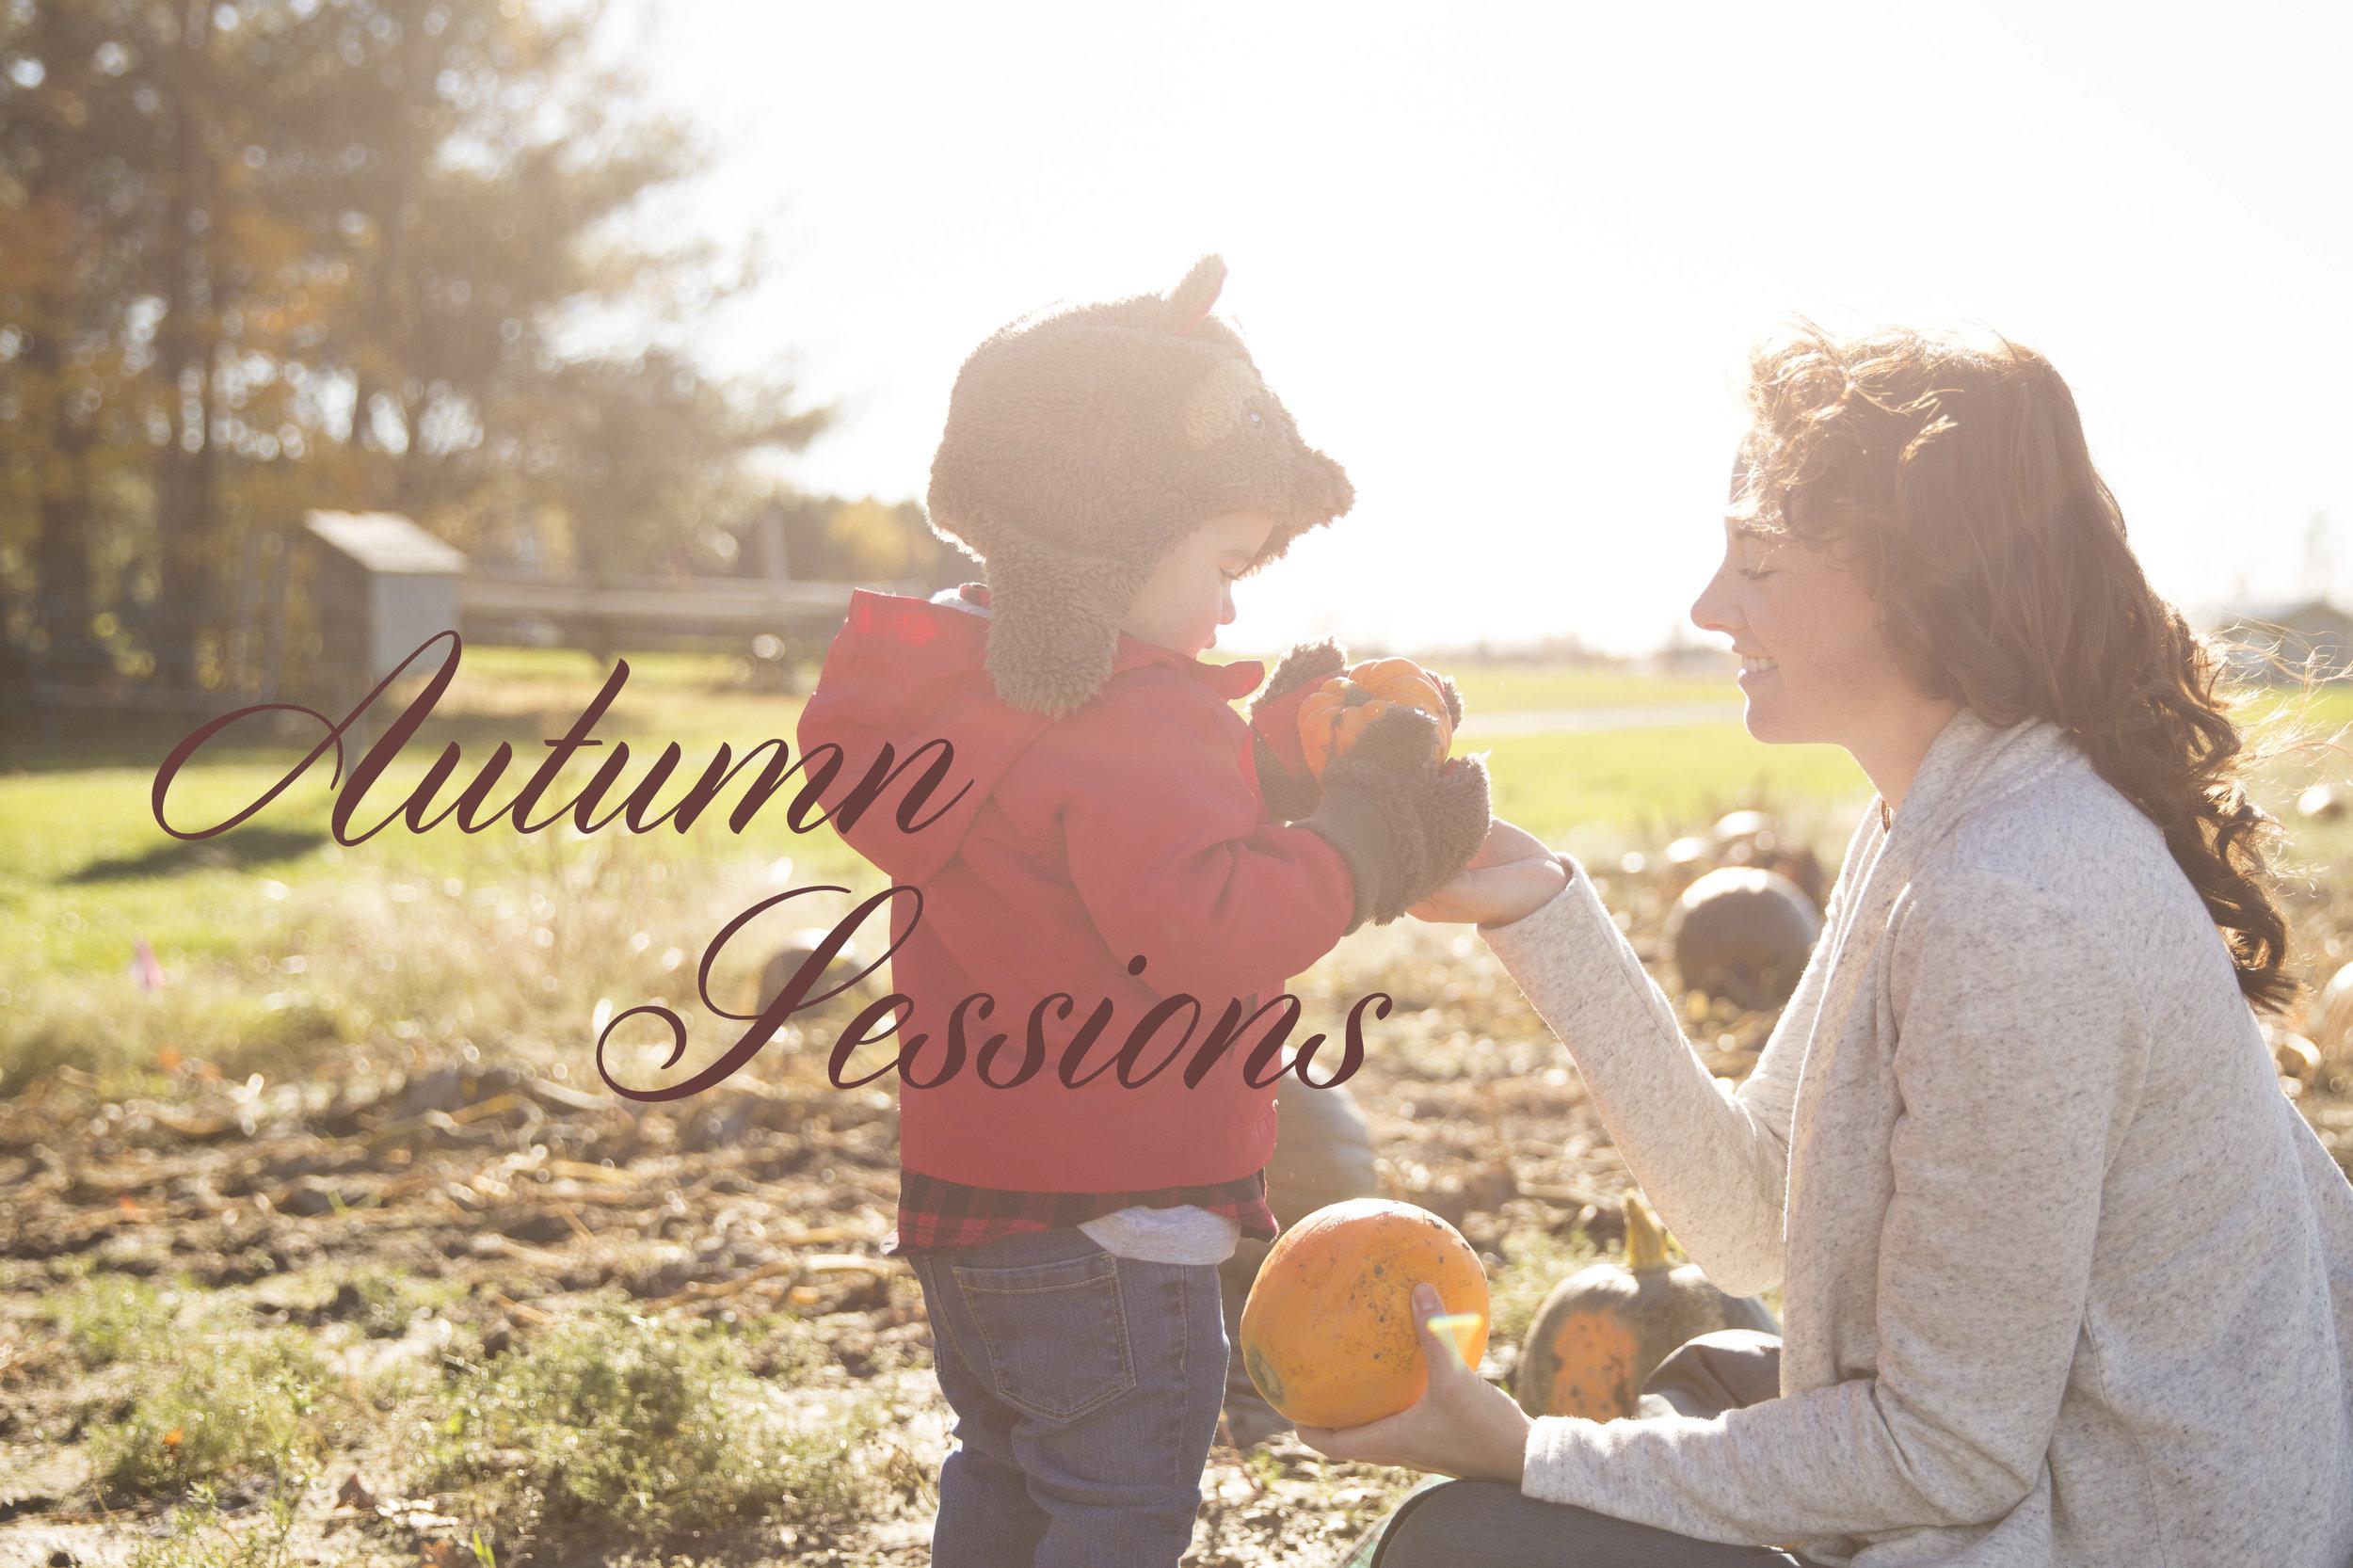 Autumn Ad-Just Joy Imaging.jpg